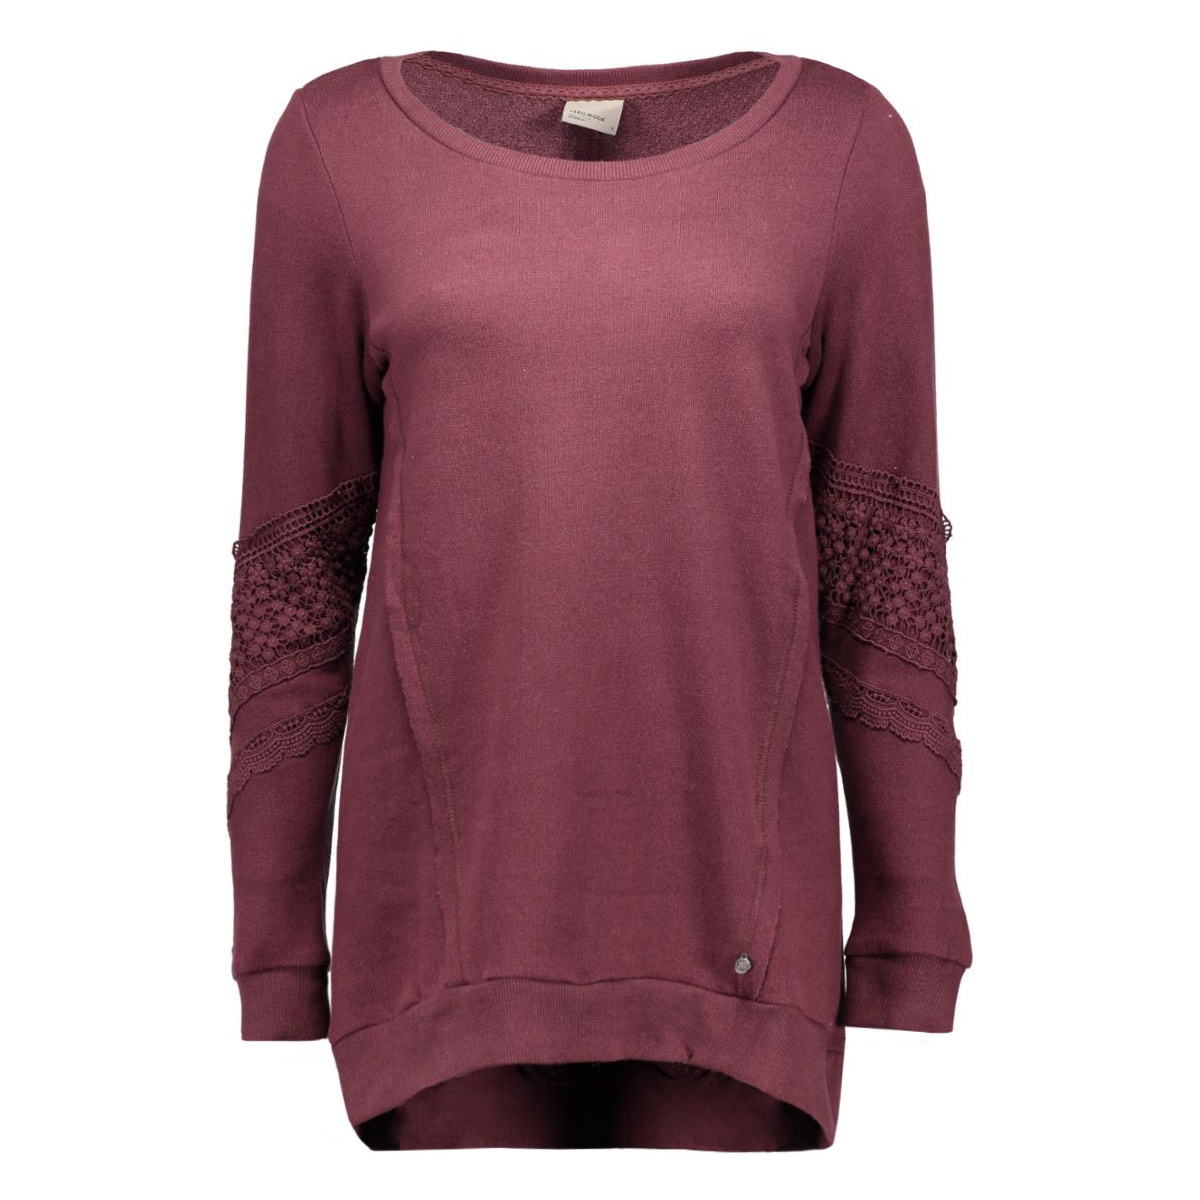 vmlisa lace l/s long top swt 10162288 vero moda sweater decadent chocol/melange